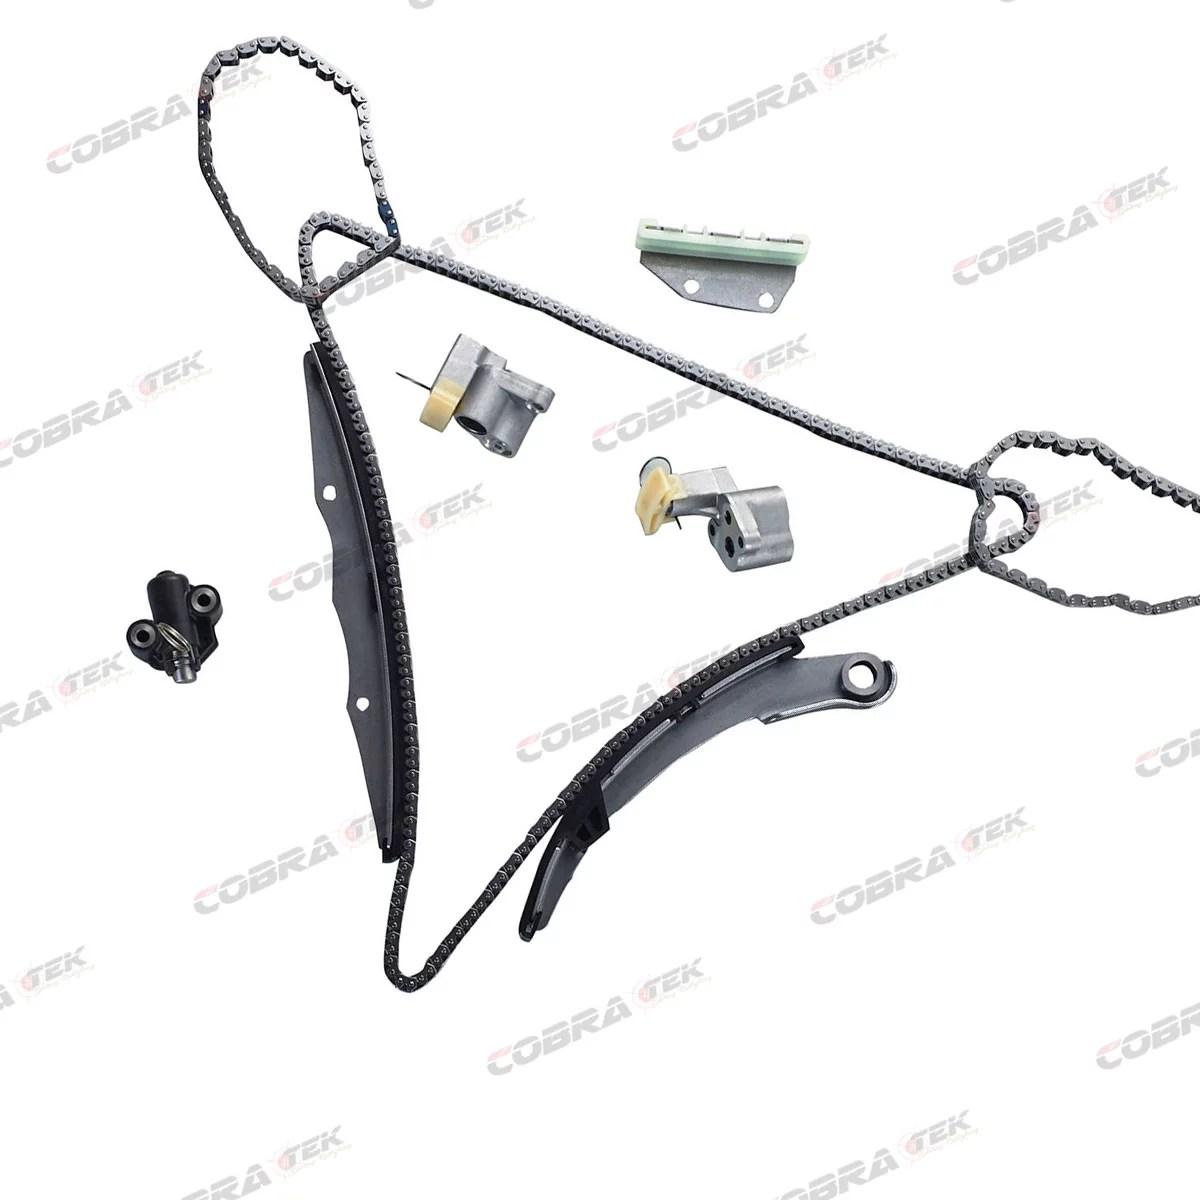 For Nissan Xterra V6 4 0l Engine Timing Chain Kit